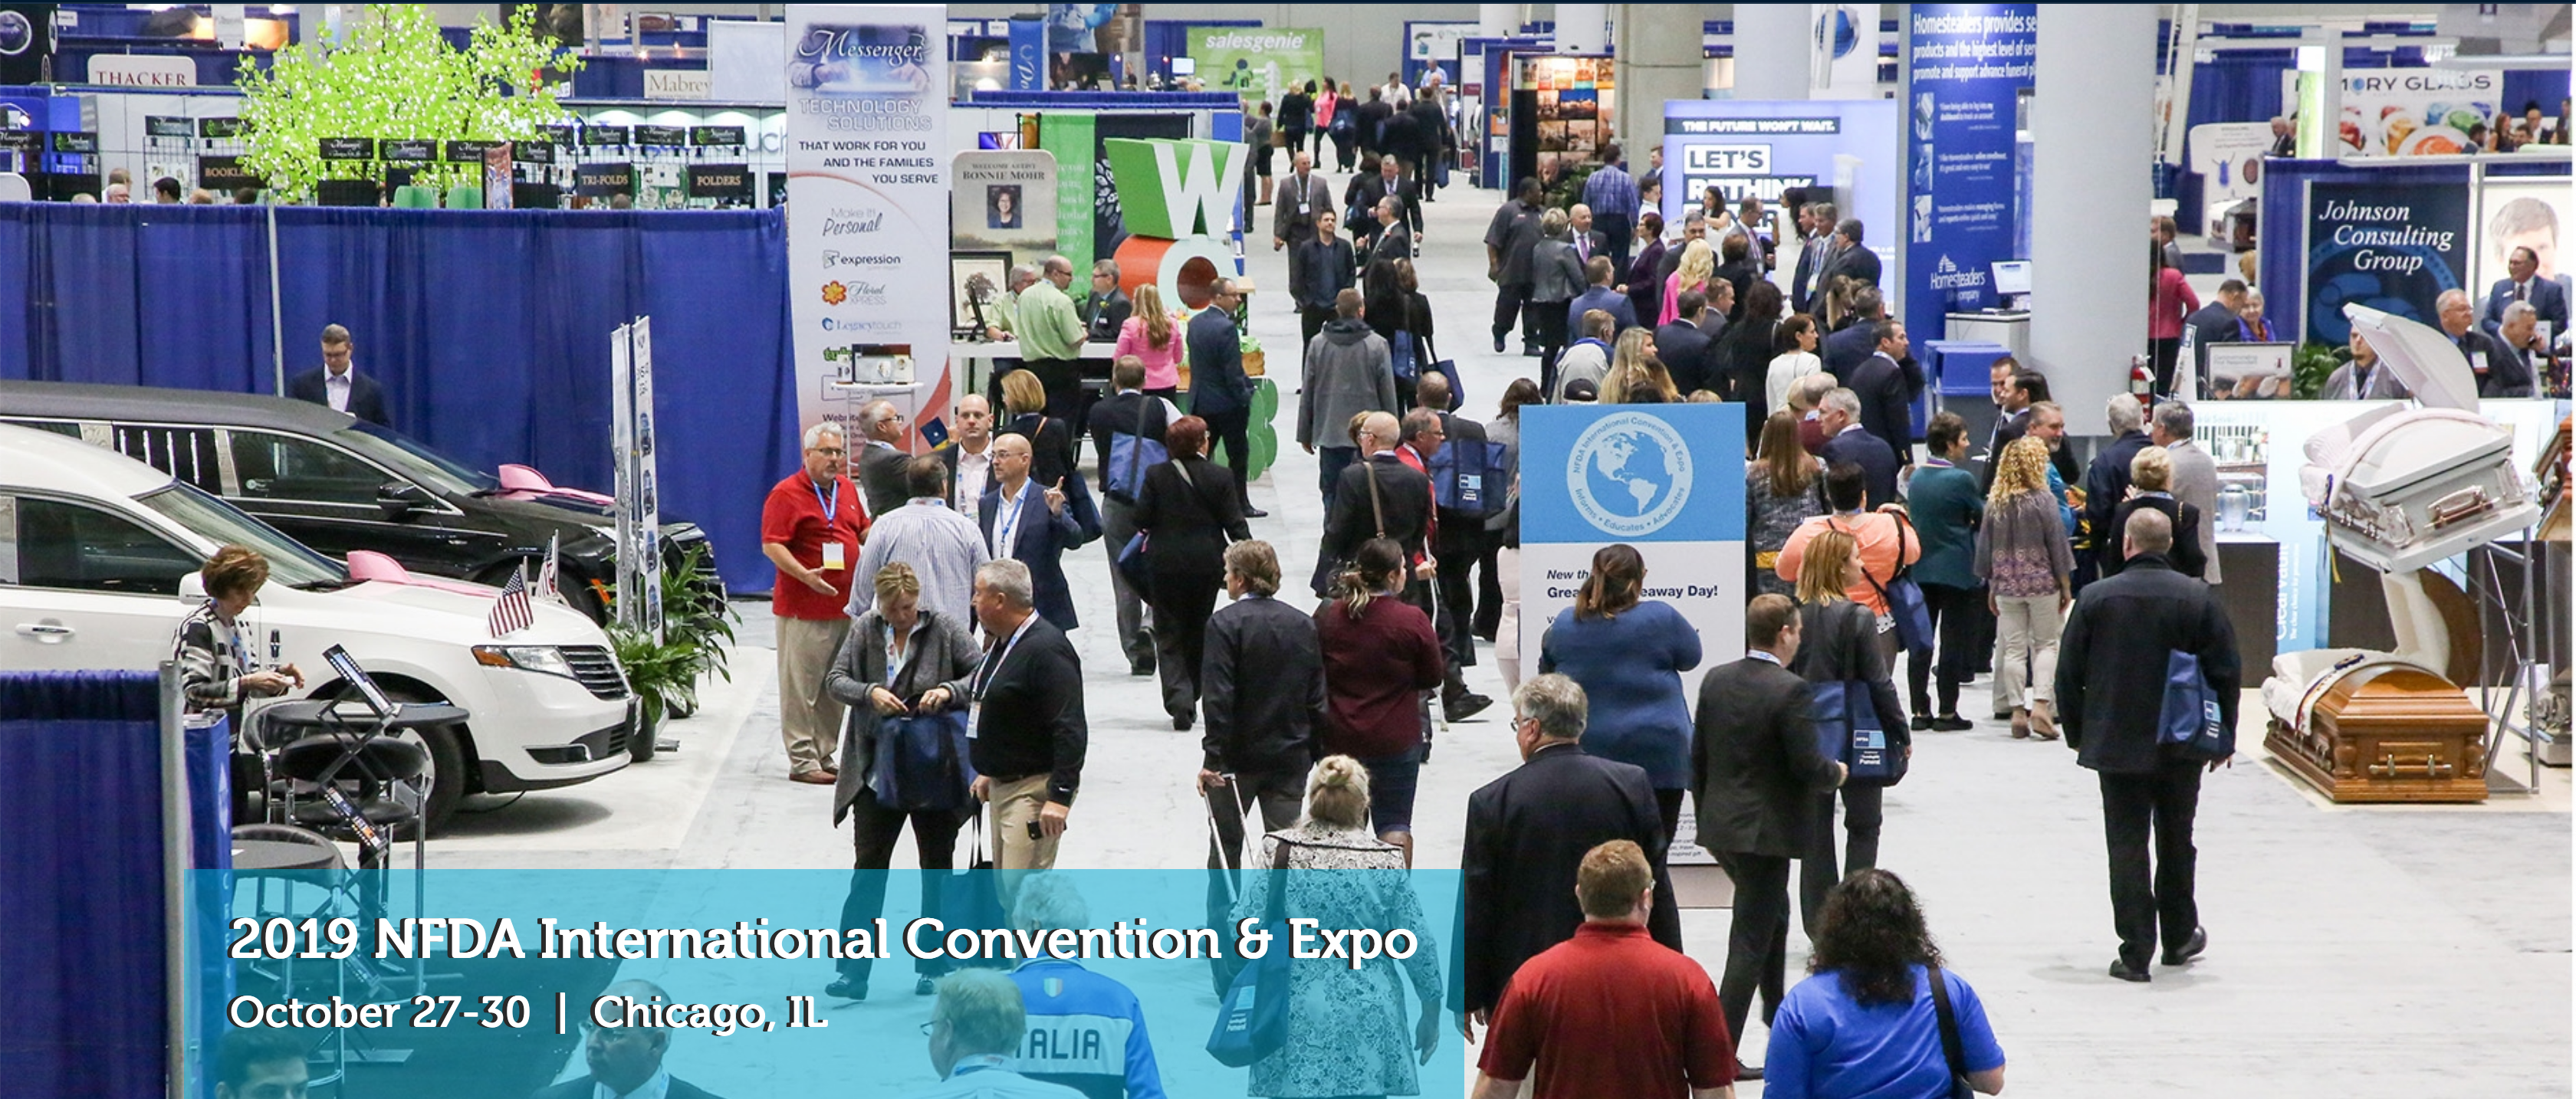 Bestselling Author, Entrepreneur Seth Godin to Headline 2019 NFDA Convention